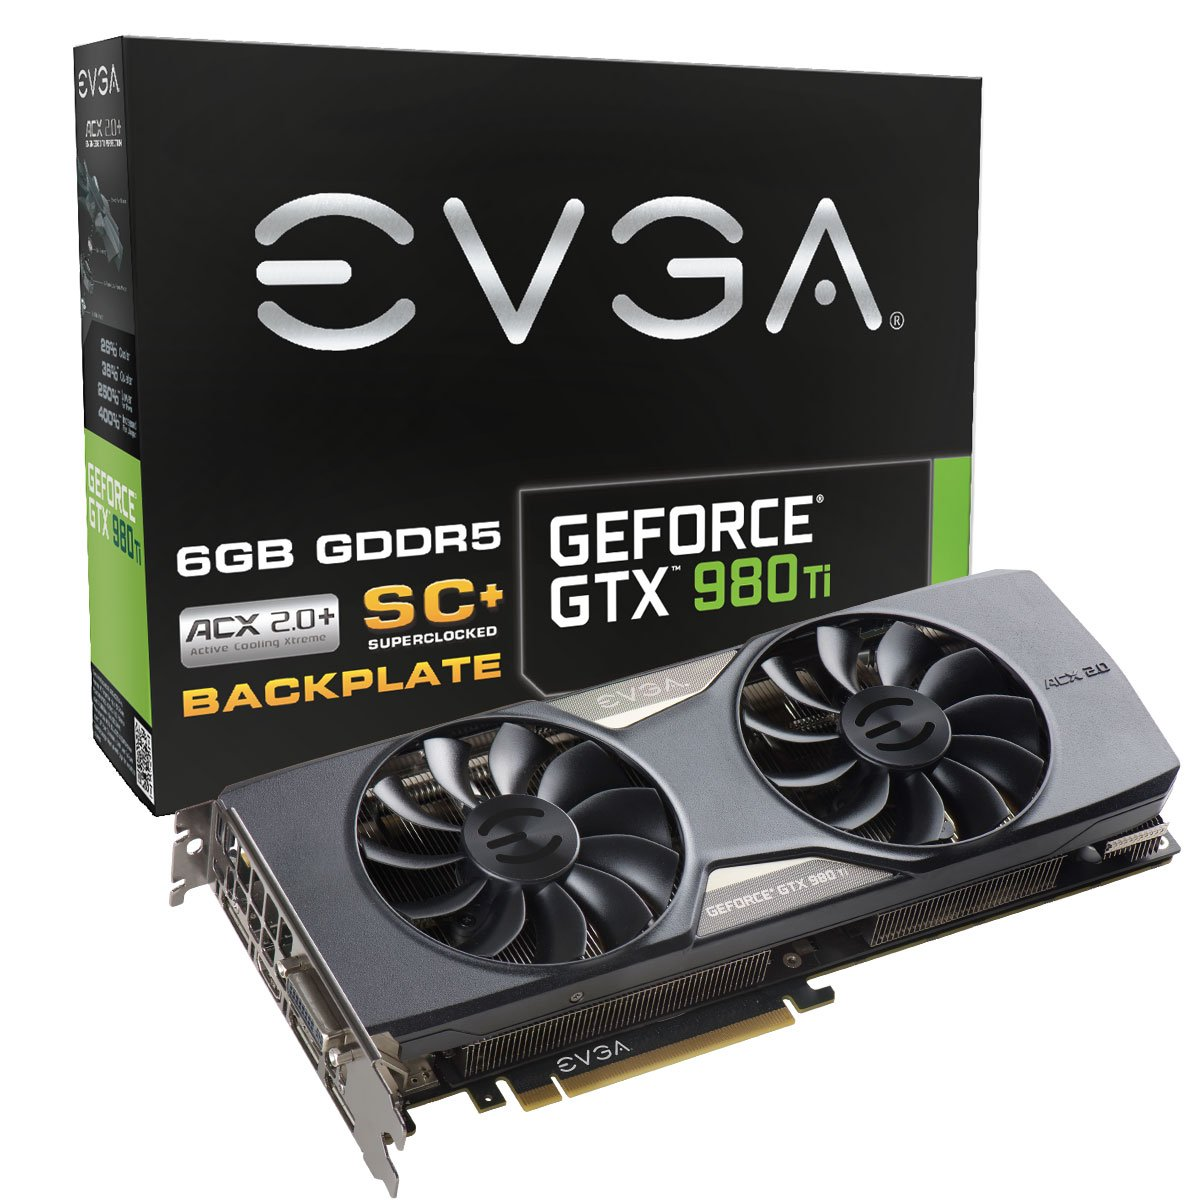 ASUS GeForce GTX 980 Ti STRIX High Performance Graphics Card